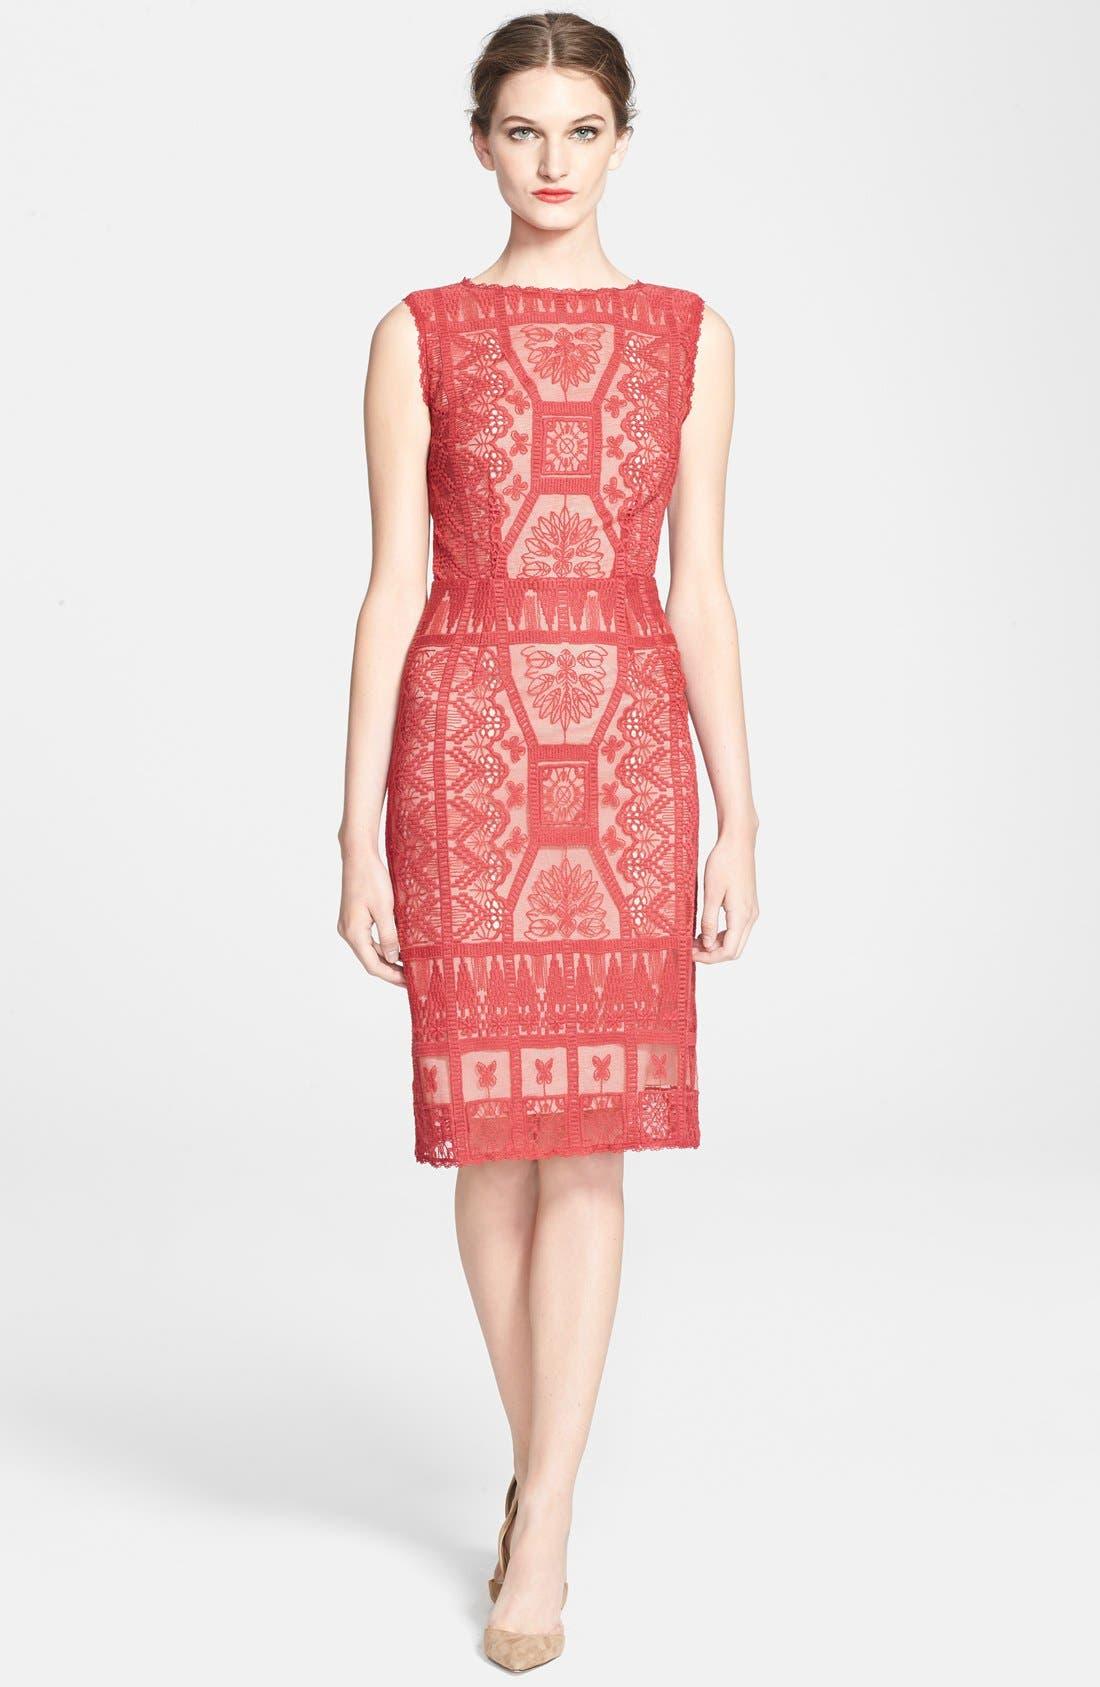 Main Image - Korovilas 'Estella' Embroidered Lace Sheath Dress